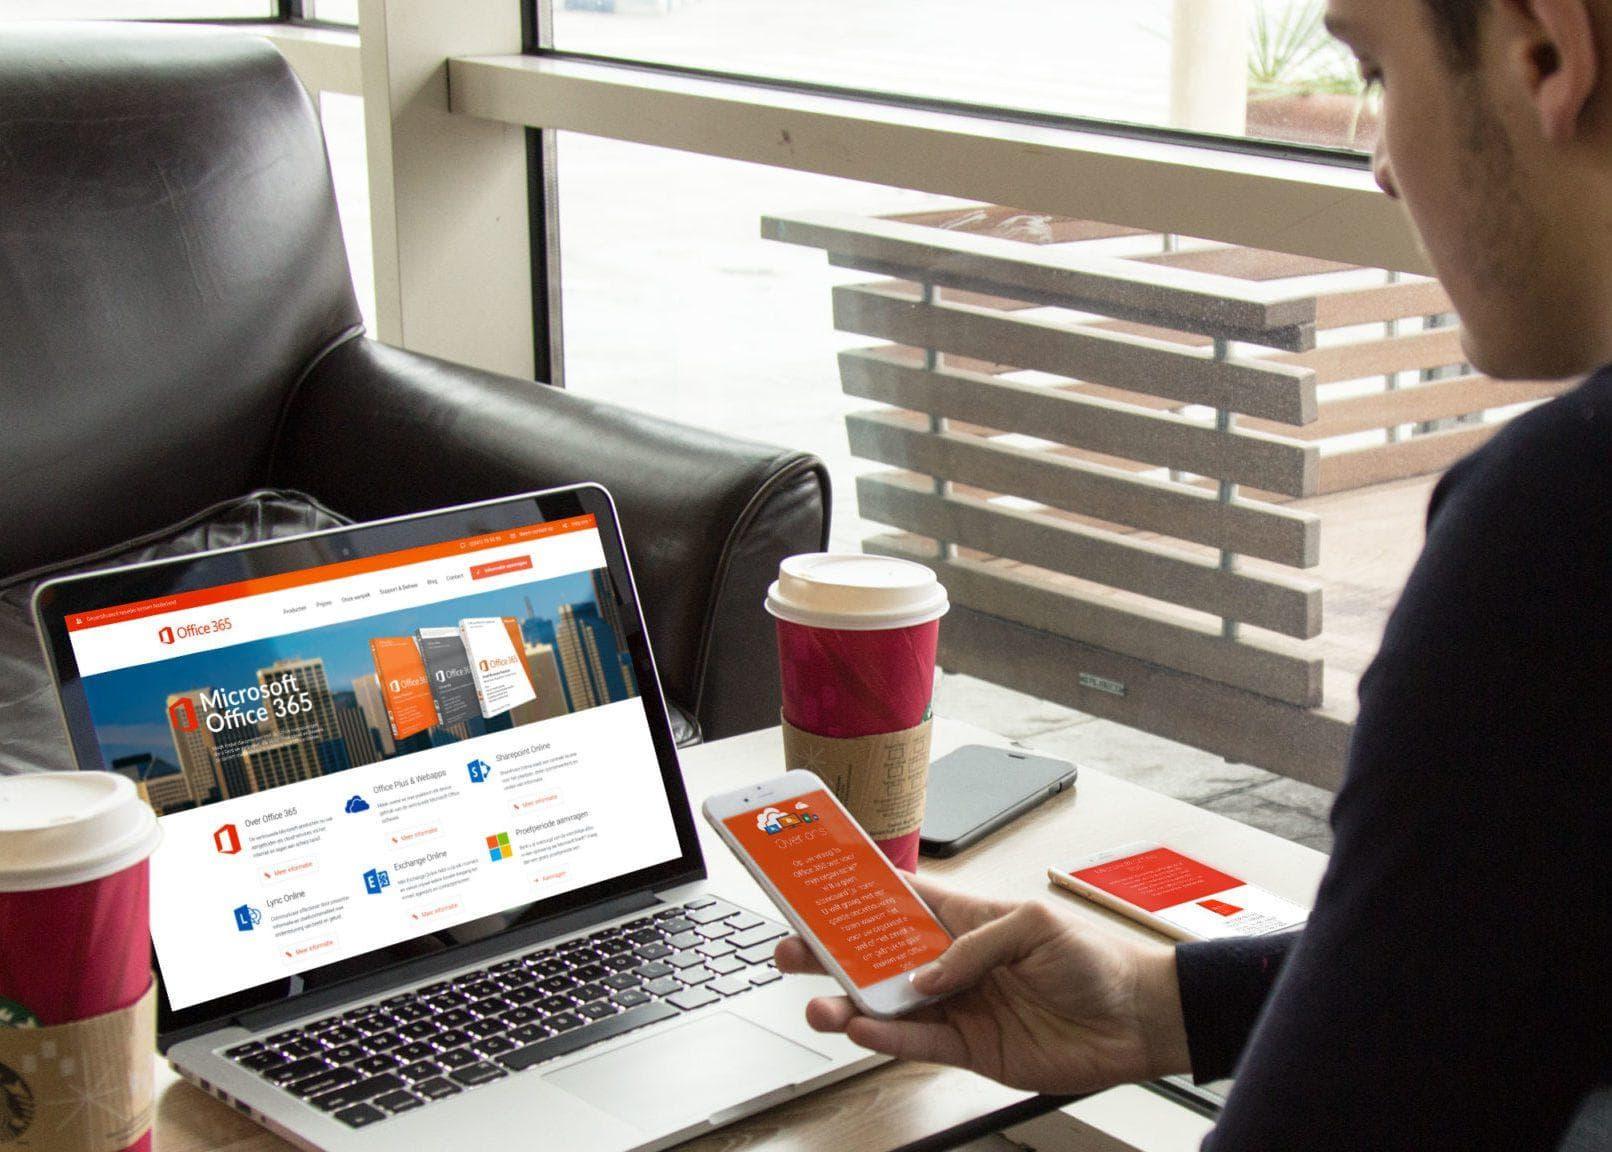 Microsoft Office 365 bij Peppix Benelux